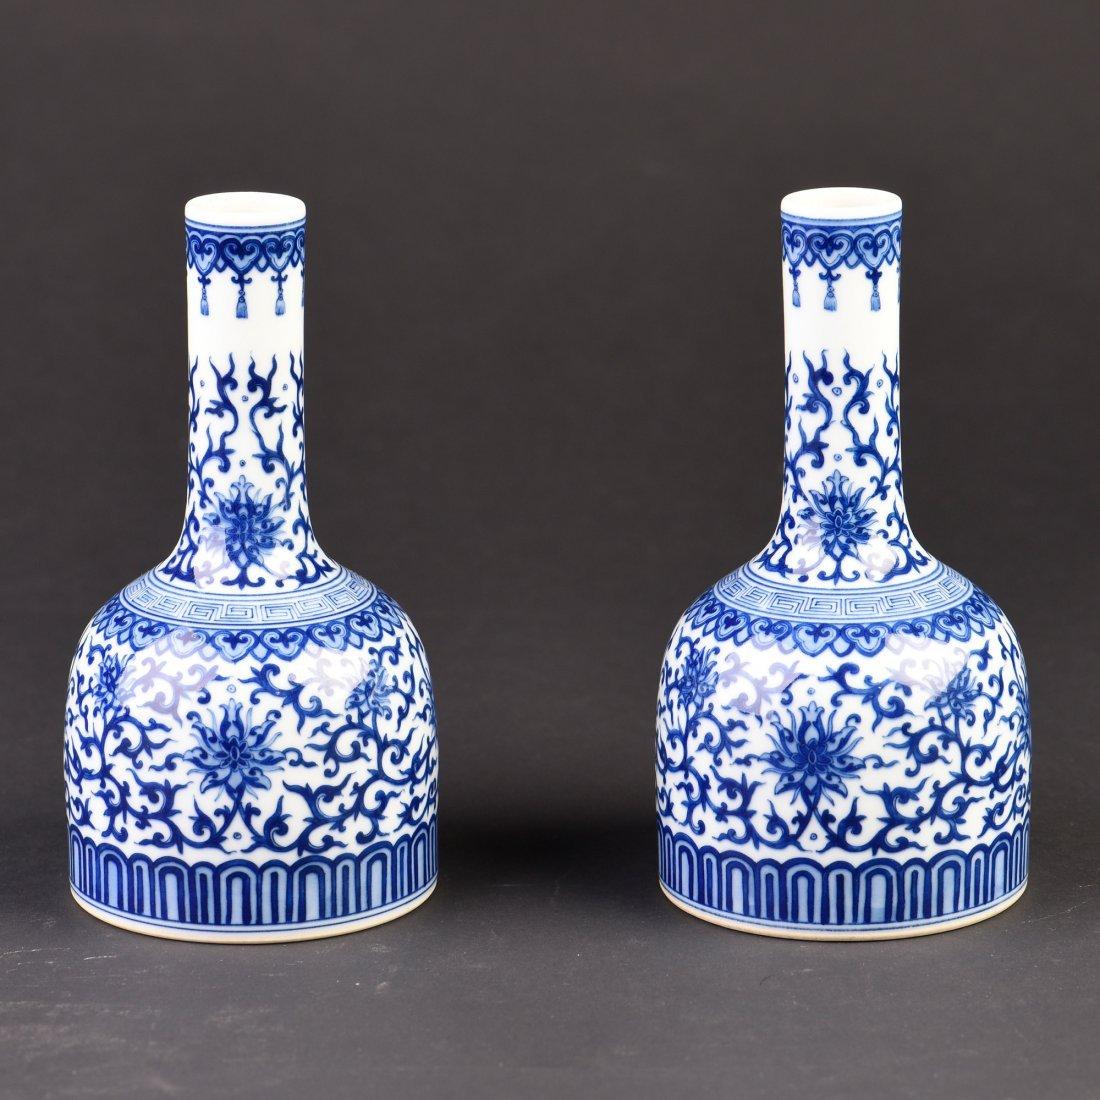 Pair of Blue and White Porcelain Vase